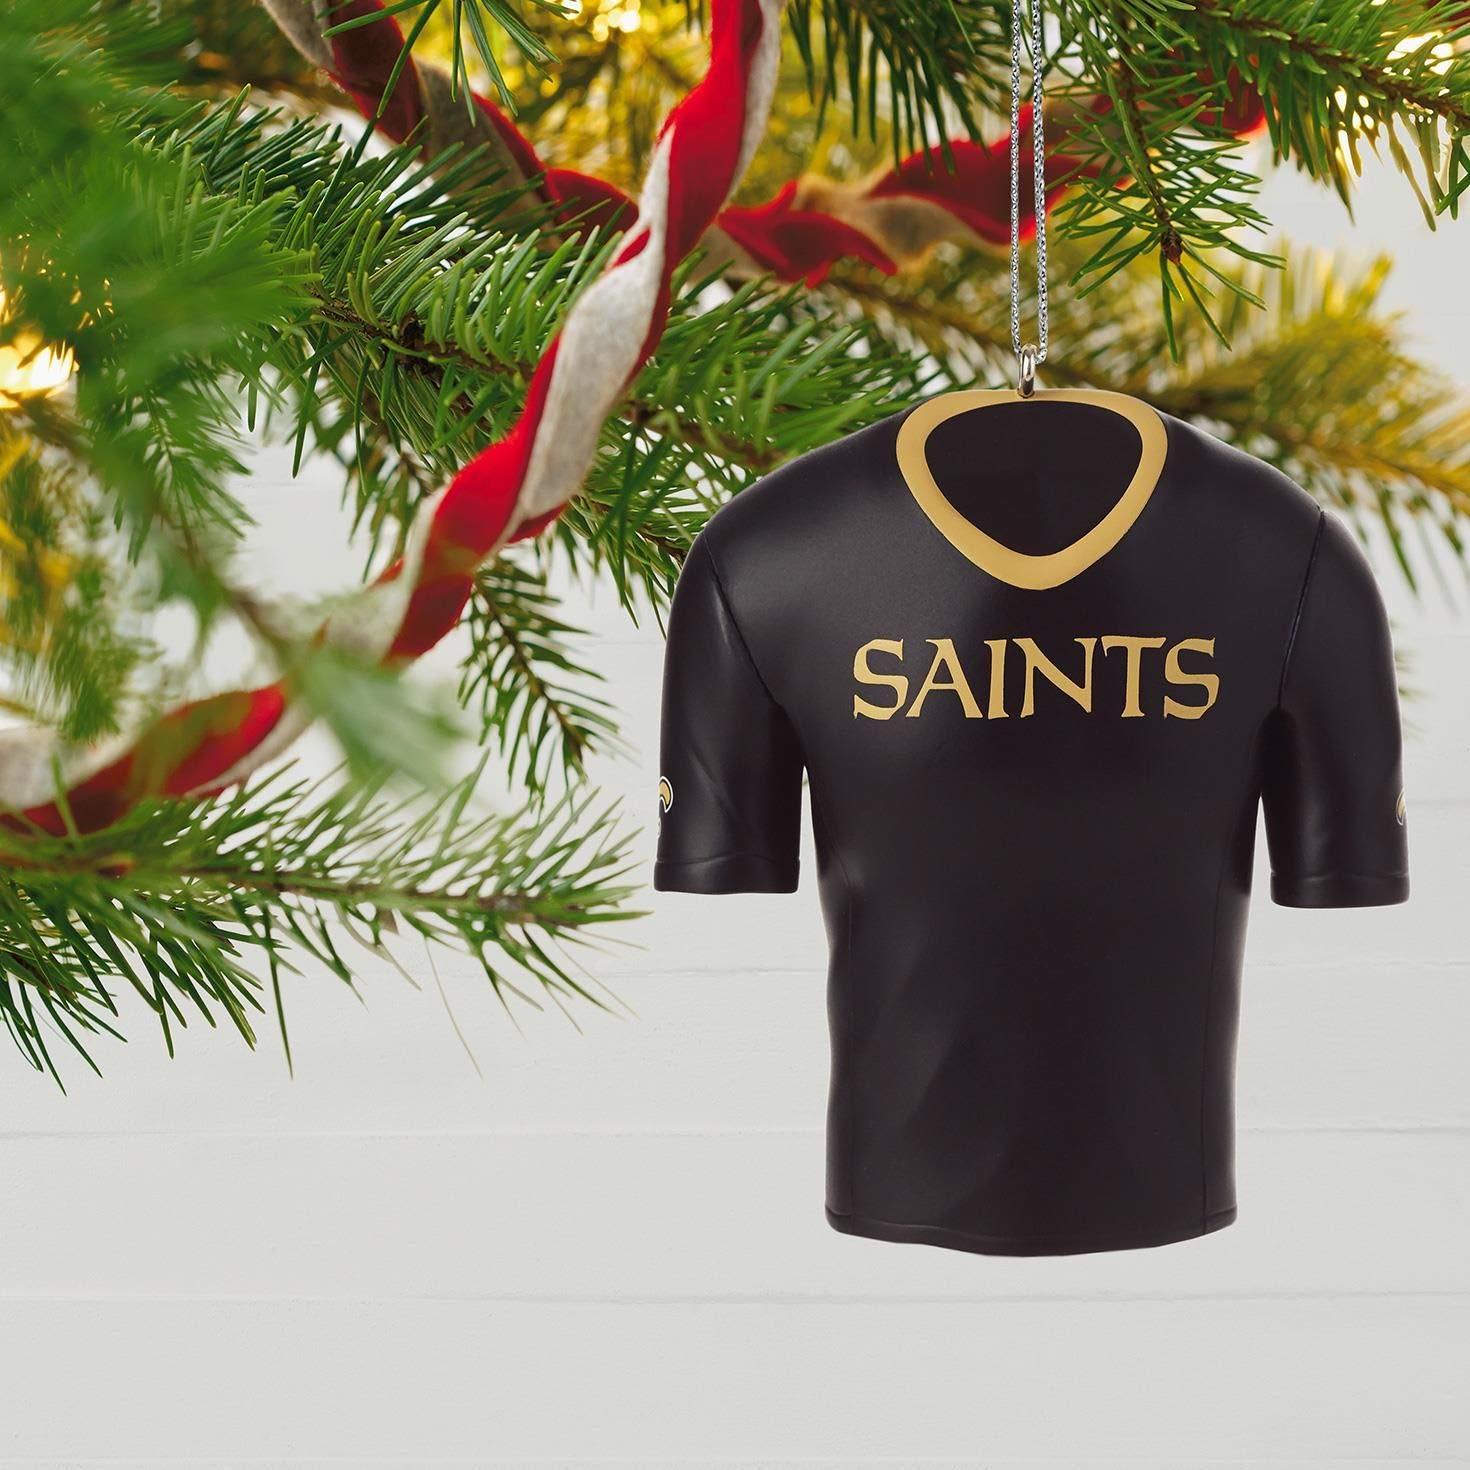 Hallmark New Orleans Saints Jersey Ornament Sports /& Activities,City /& State